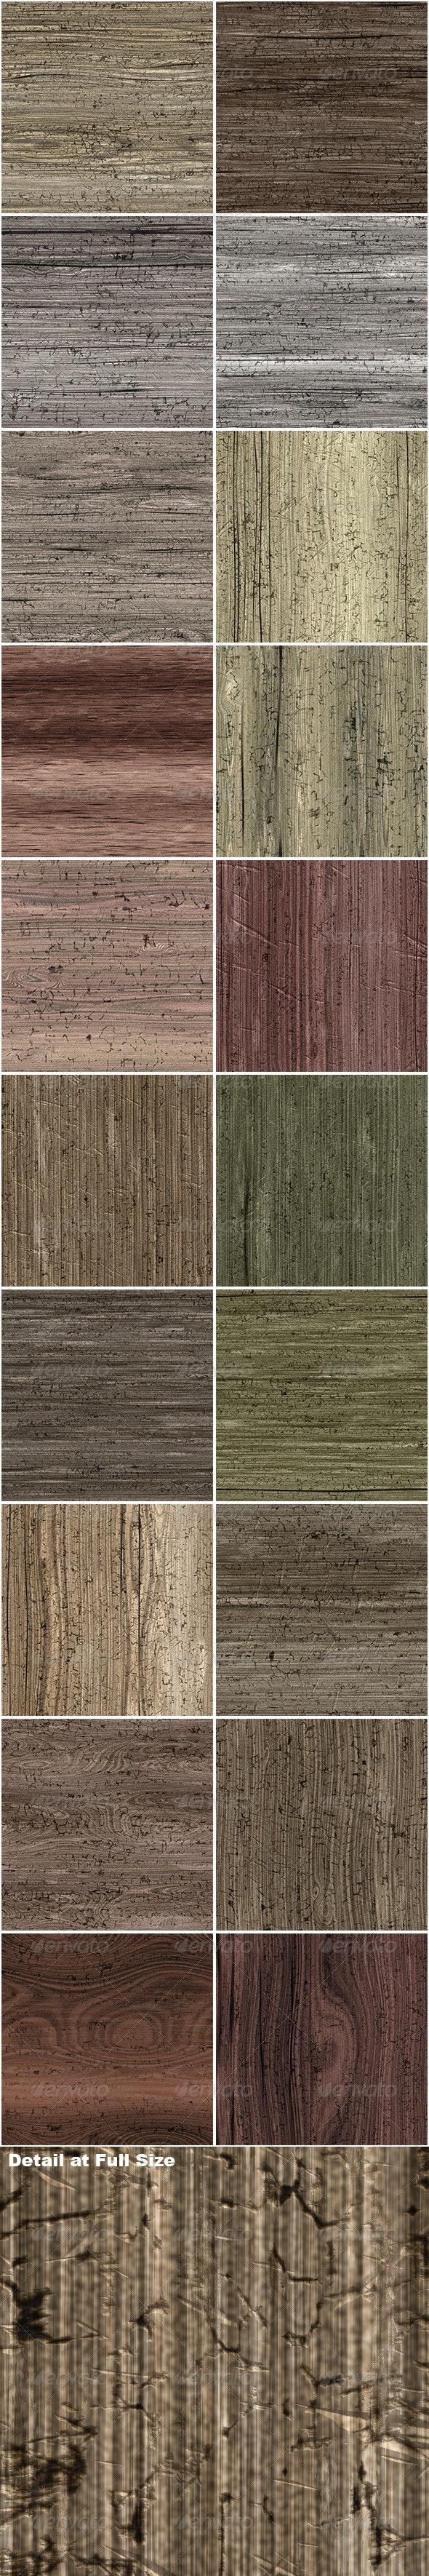 20 Seamless Worn Wood Textures - Wood Textures